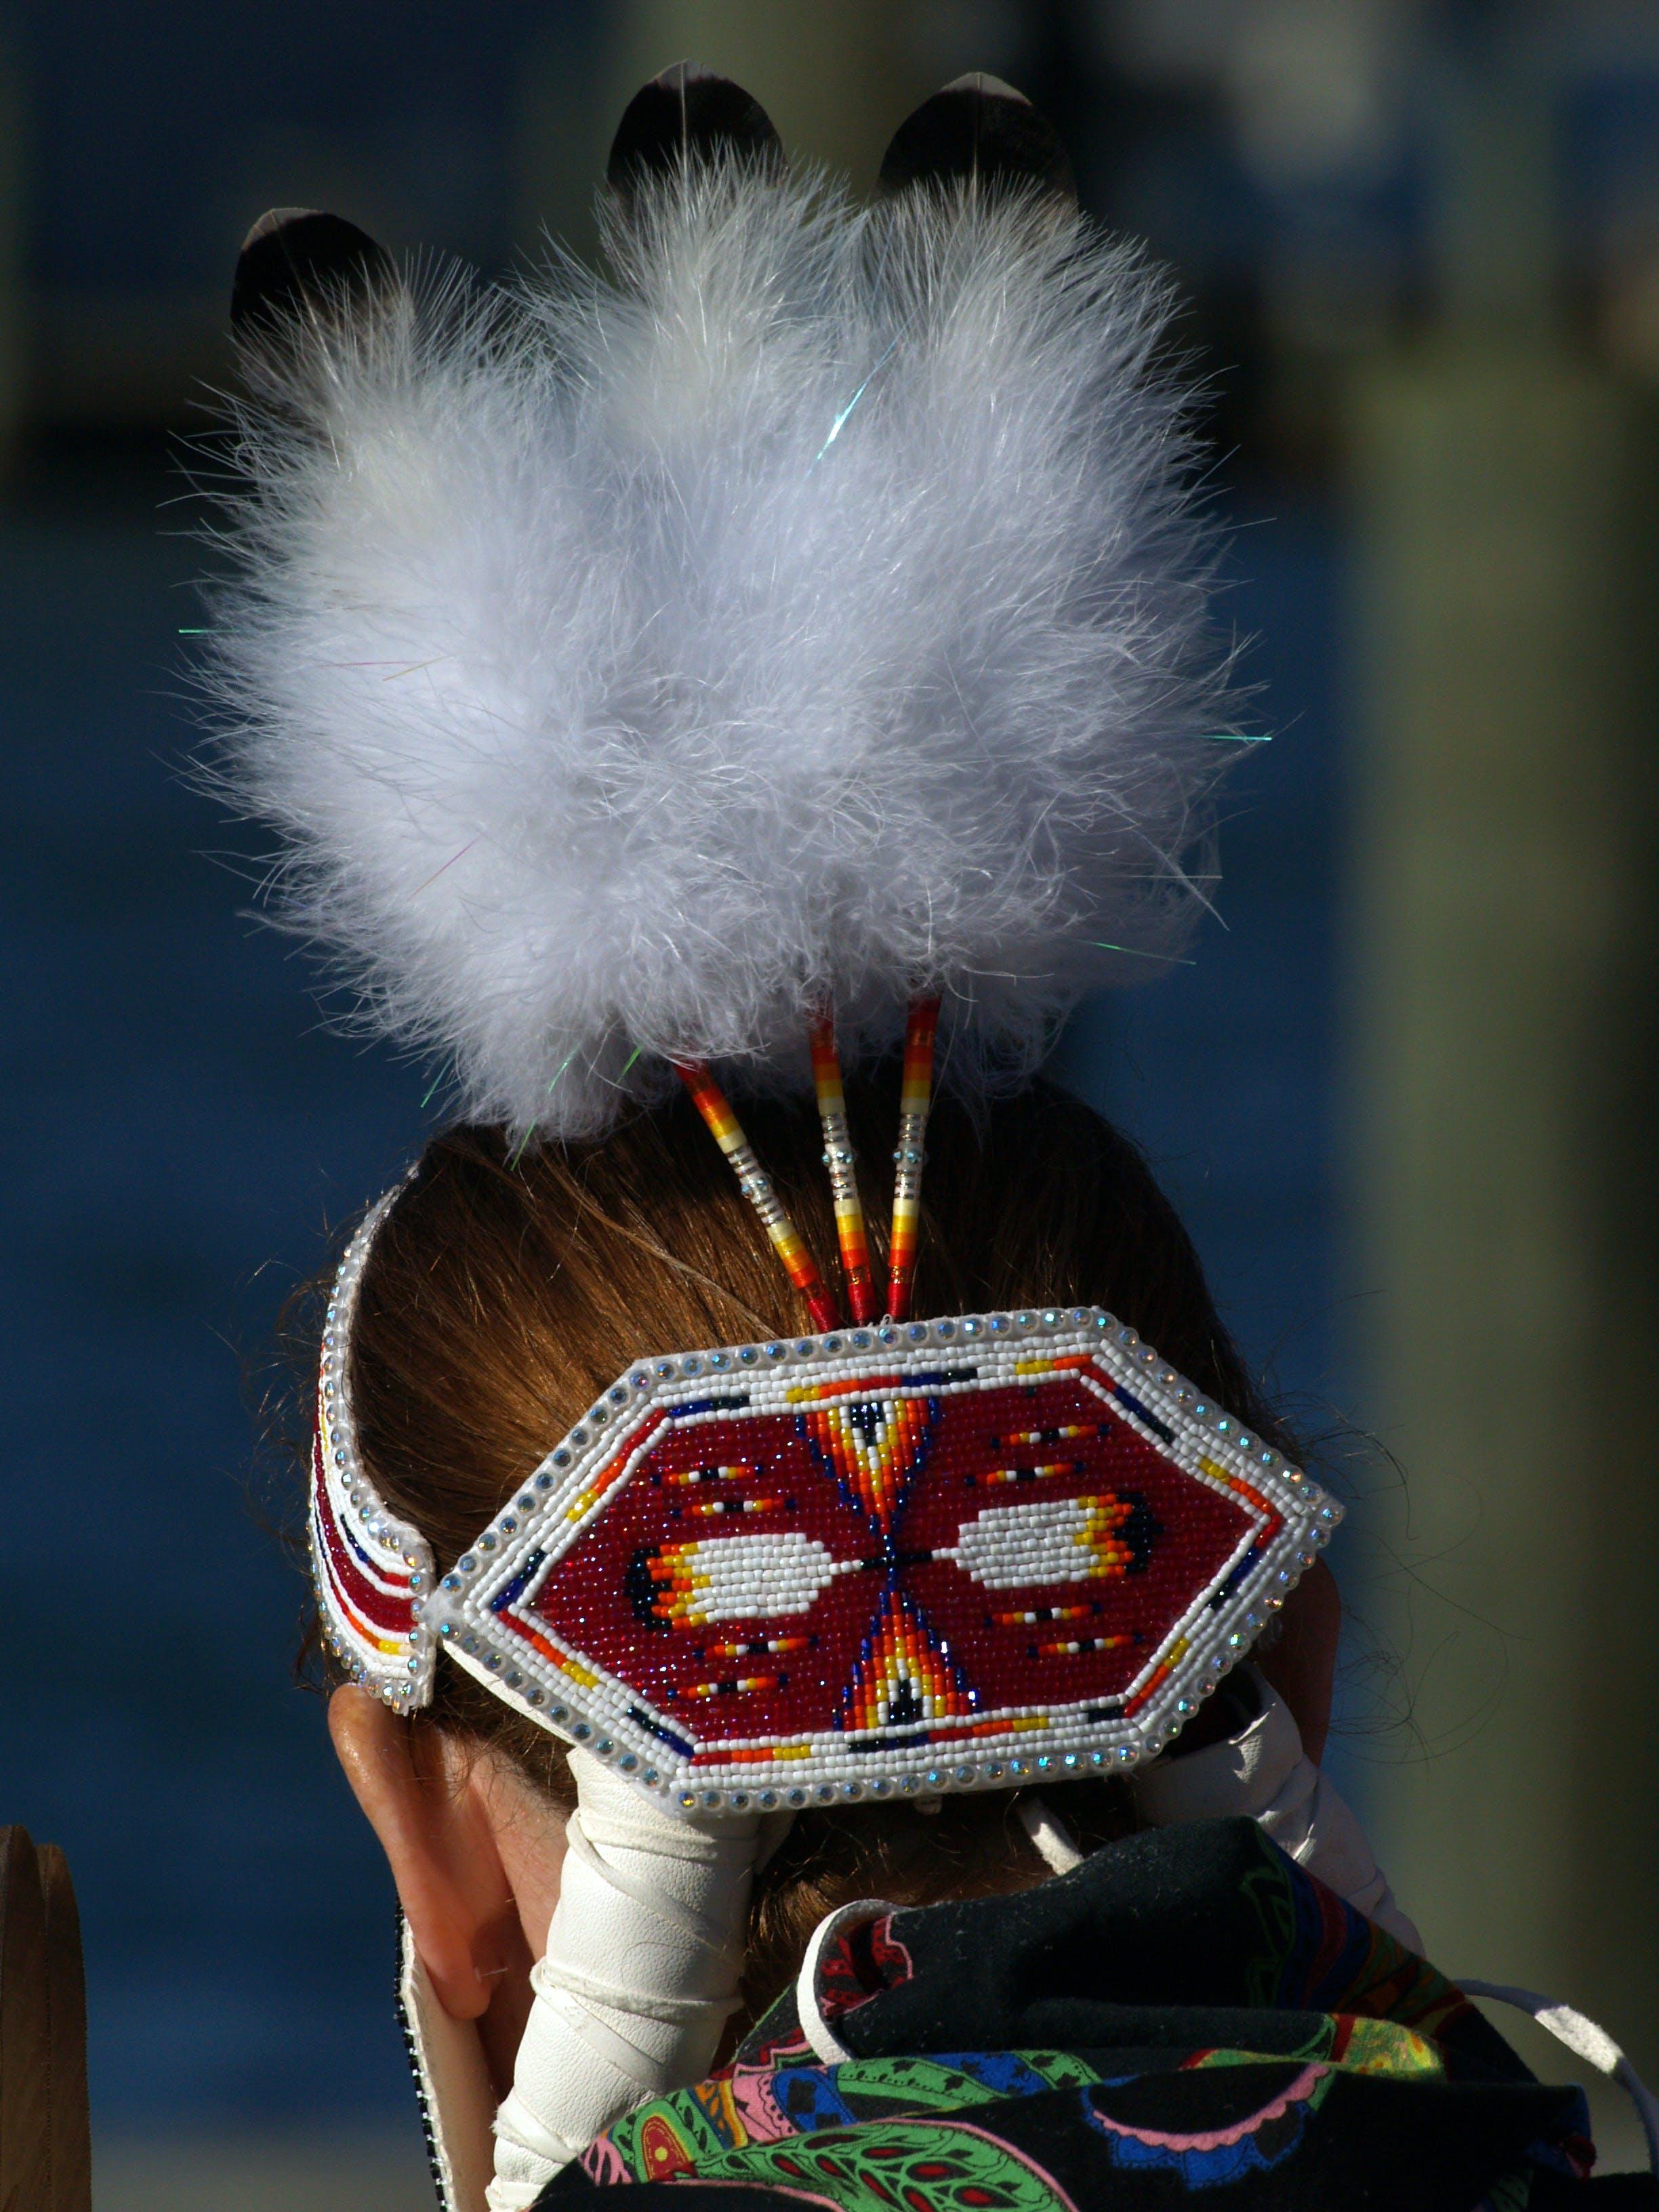 Free stock photo of feathers, native american headress, woman